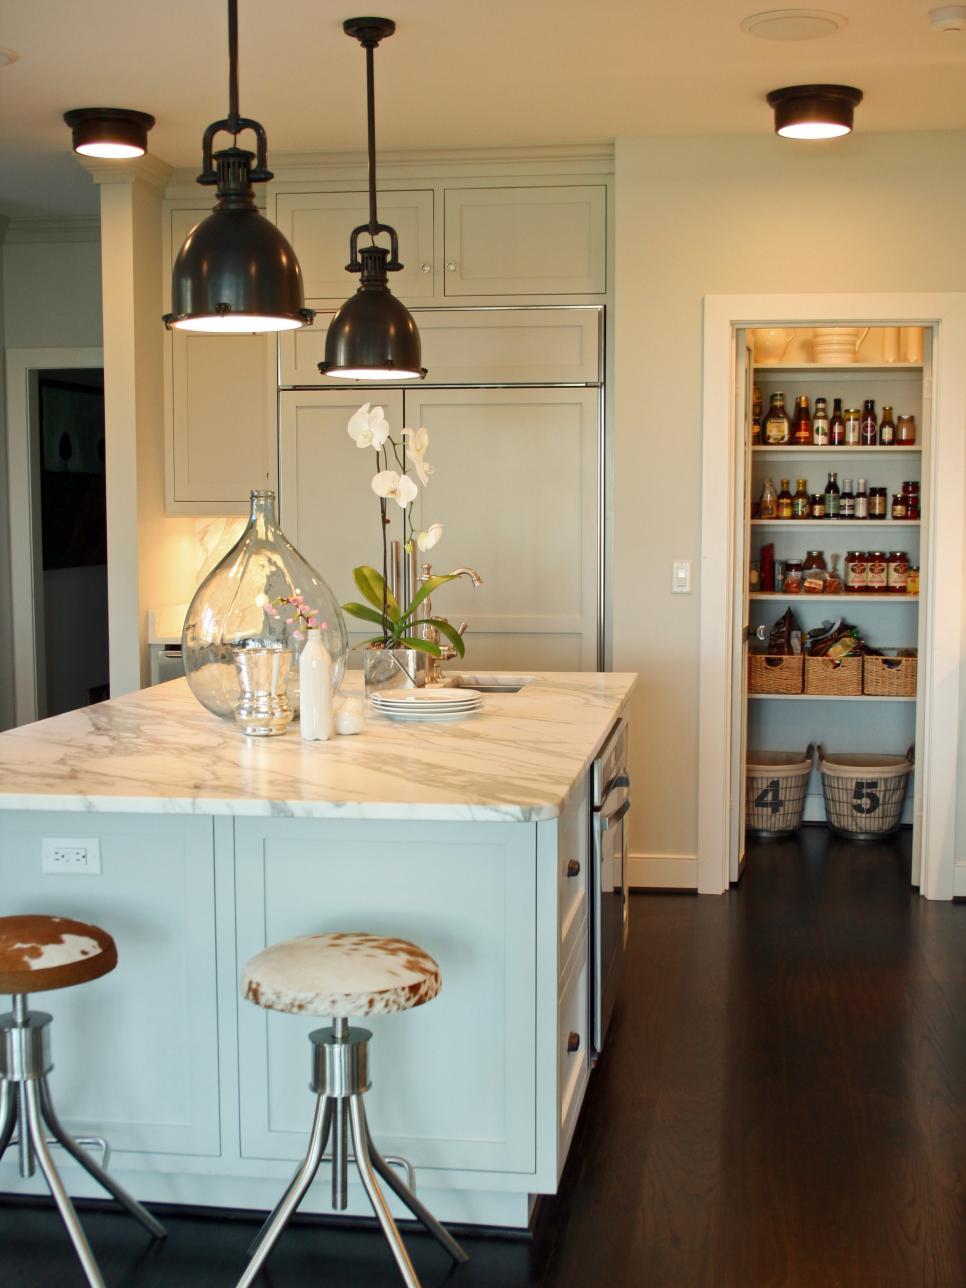 kitchen light fixtures kitchen lighting design tips | hgtv YEVKOWT